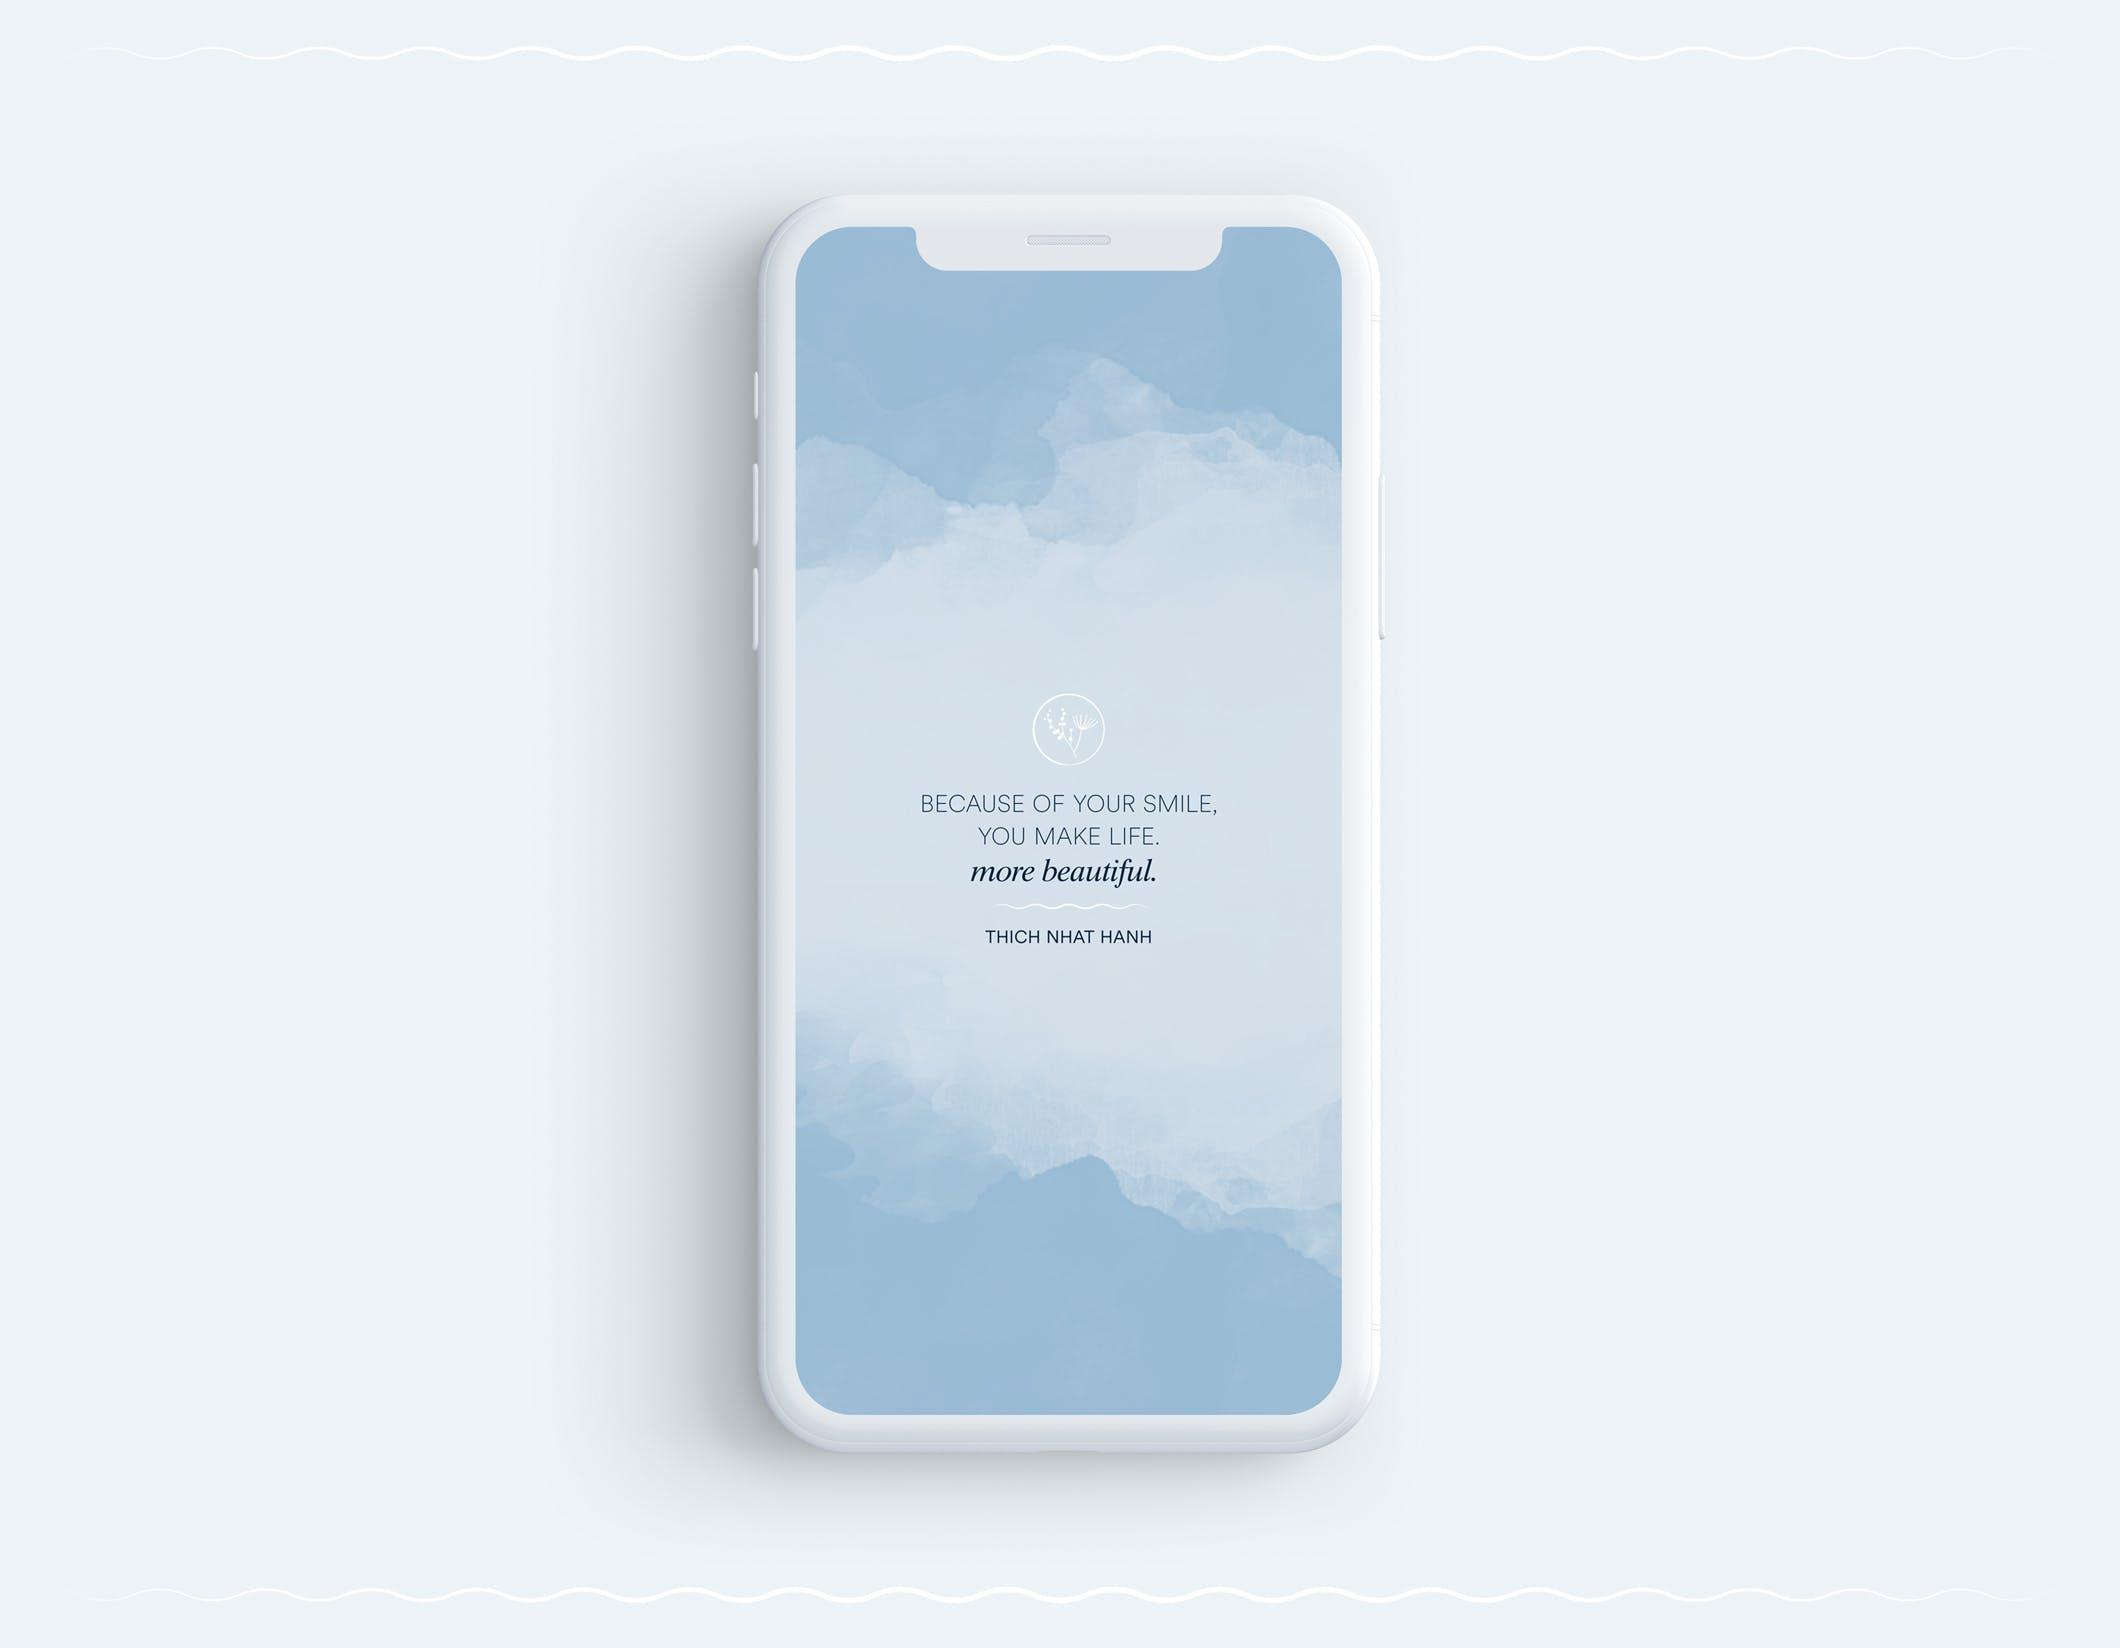 iphone quote wallpaper